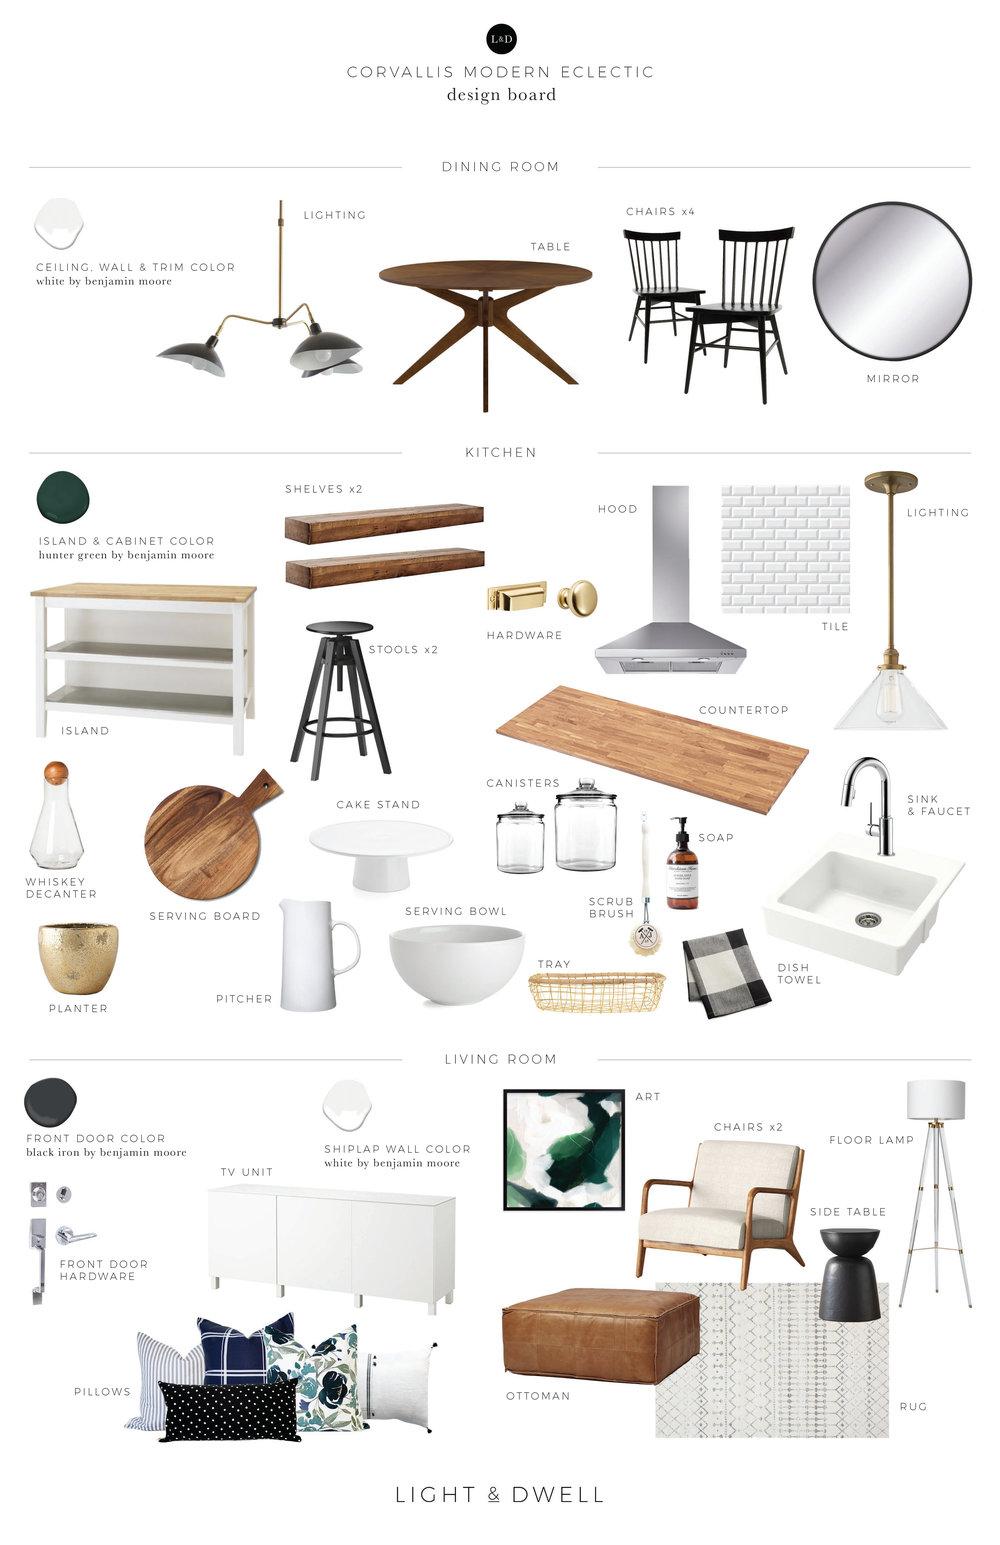 L+D_DesignBoard_CorvallisModernEclectic.jpg